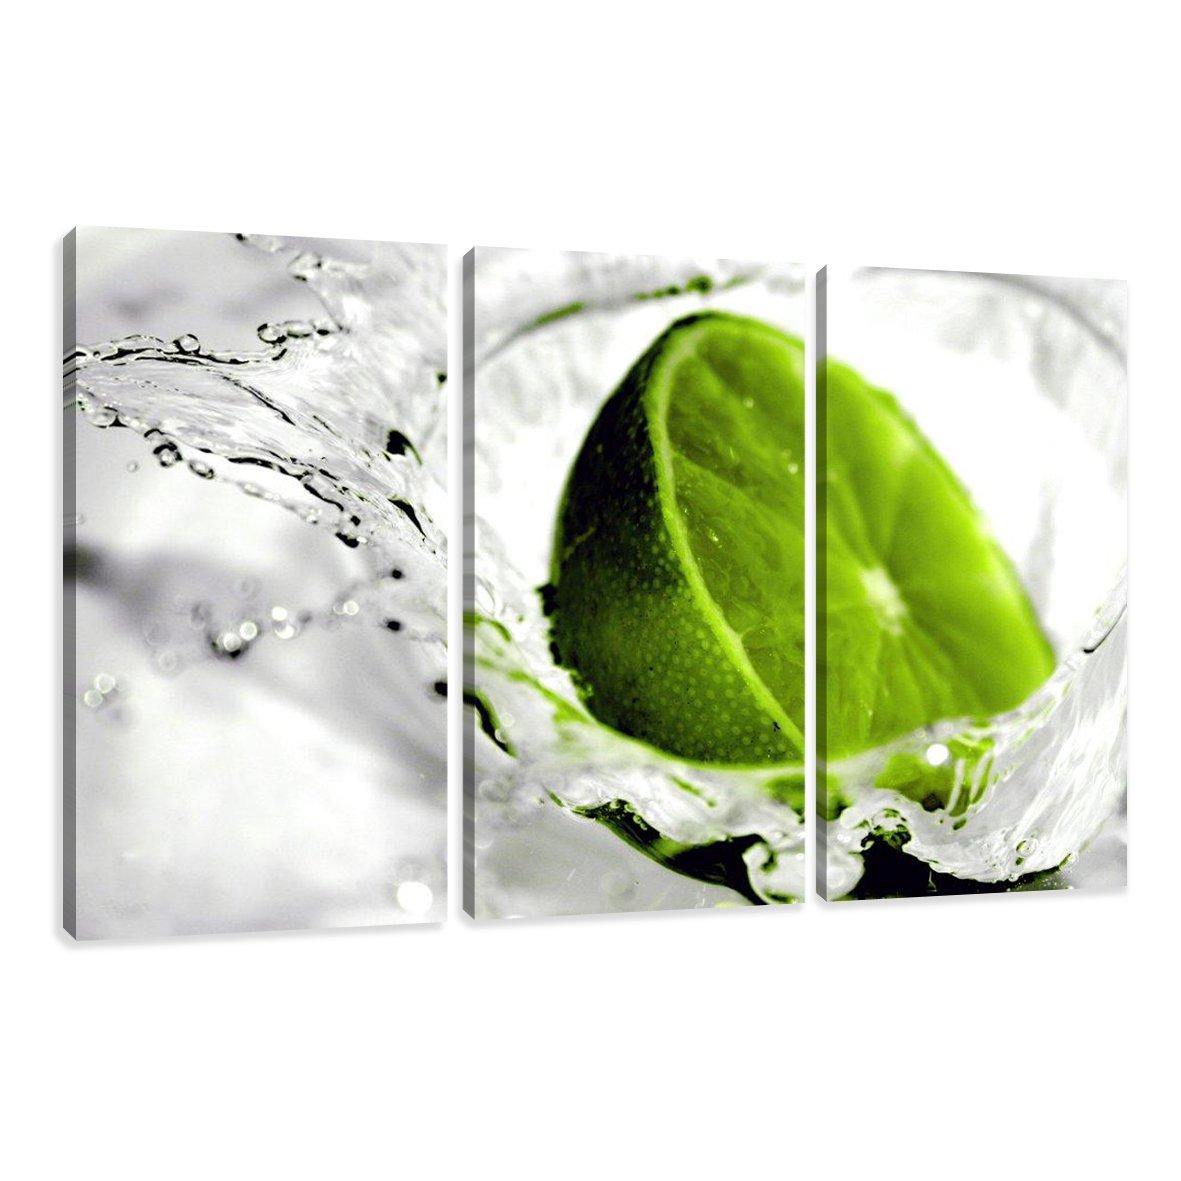 Amazon.de: Visario Leinwandbilder 1131 Bild auf Leinwand Lime, 160 x ...